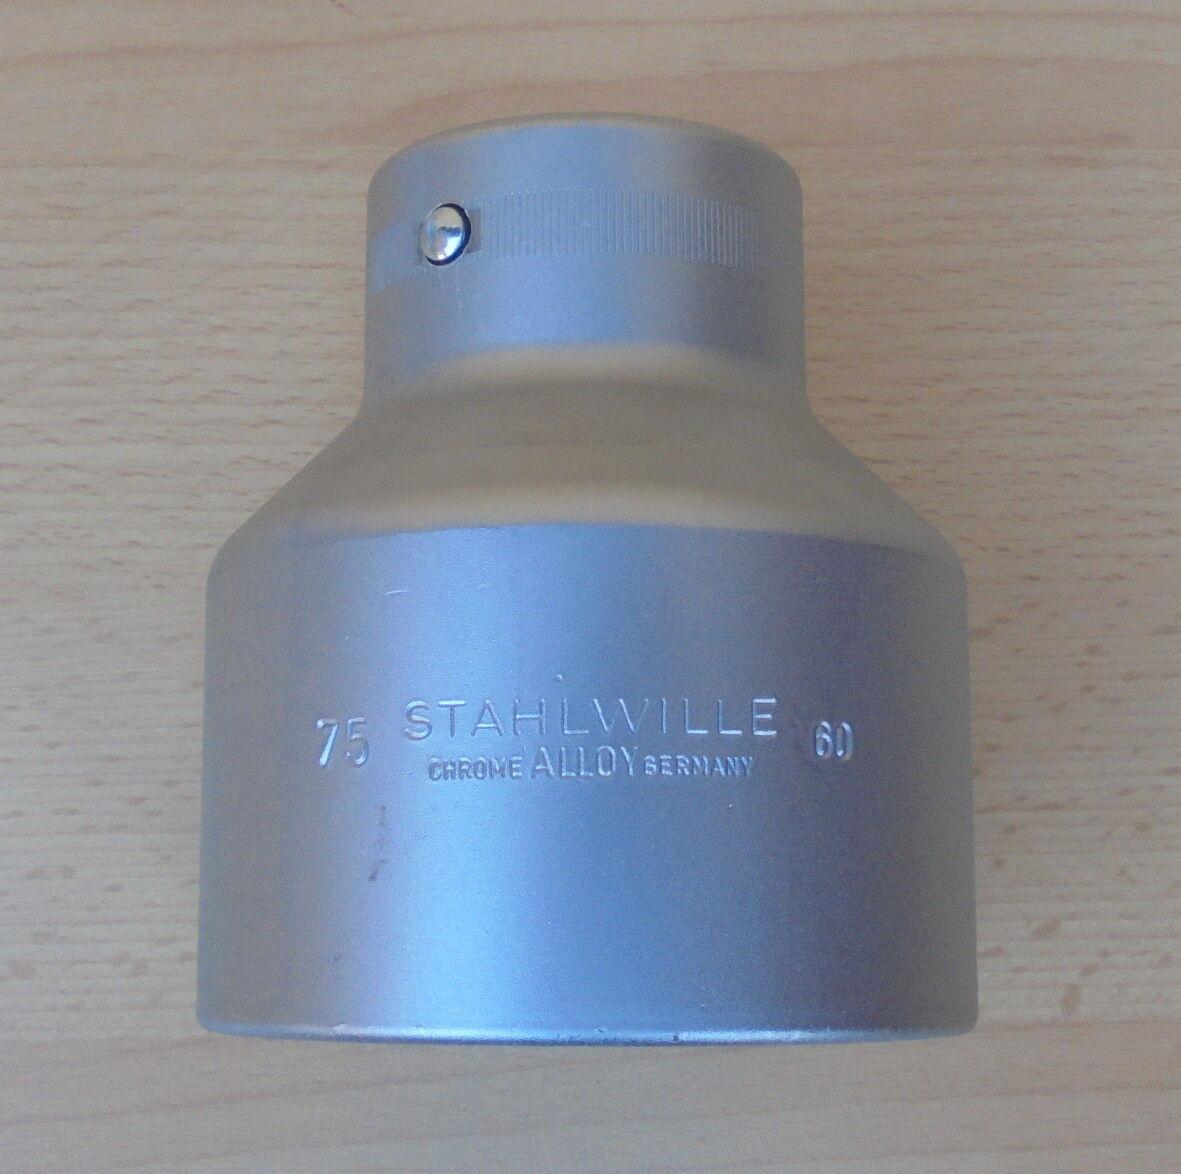 Stahlwille 60 75 mm Steckschlüsseleinsatz 6-Kant Nuss